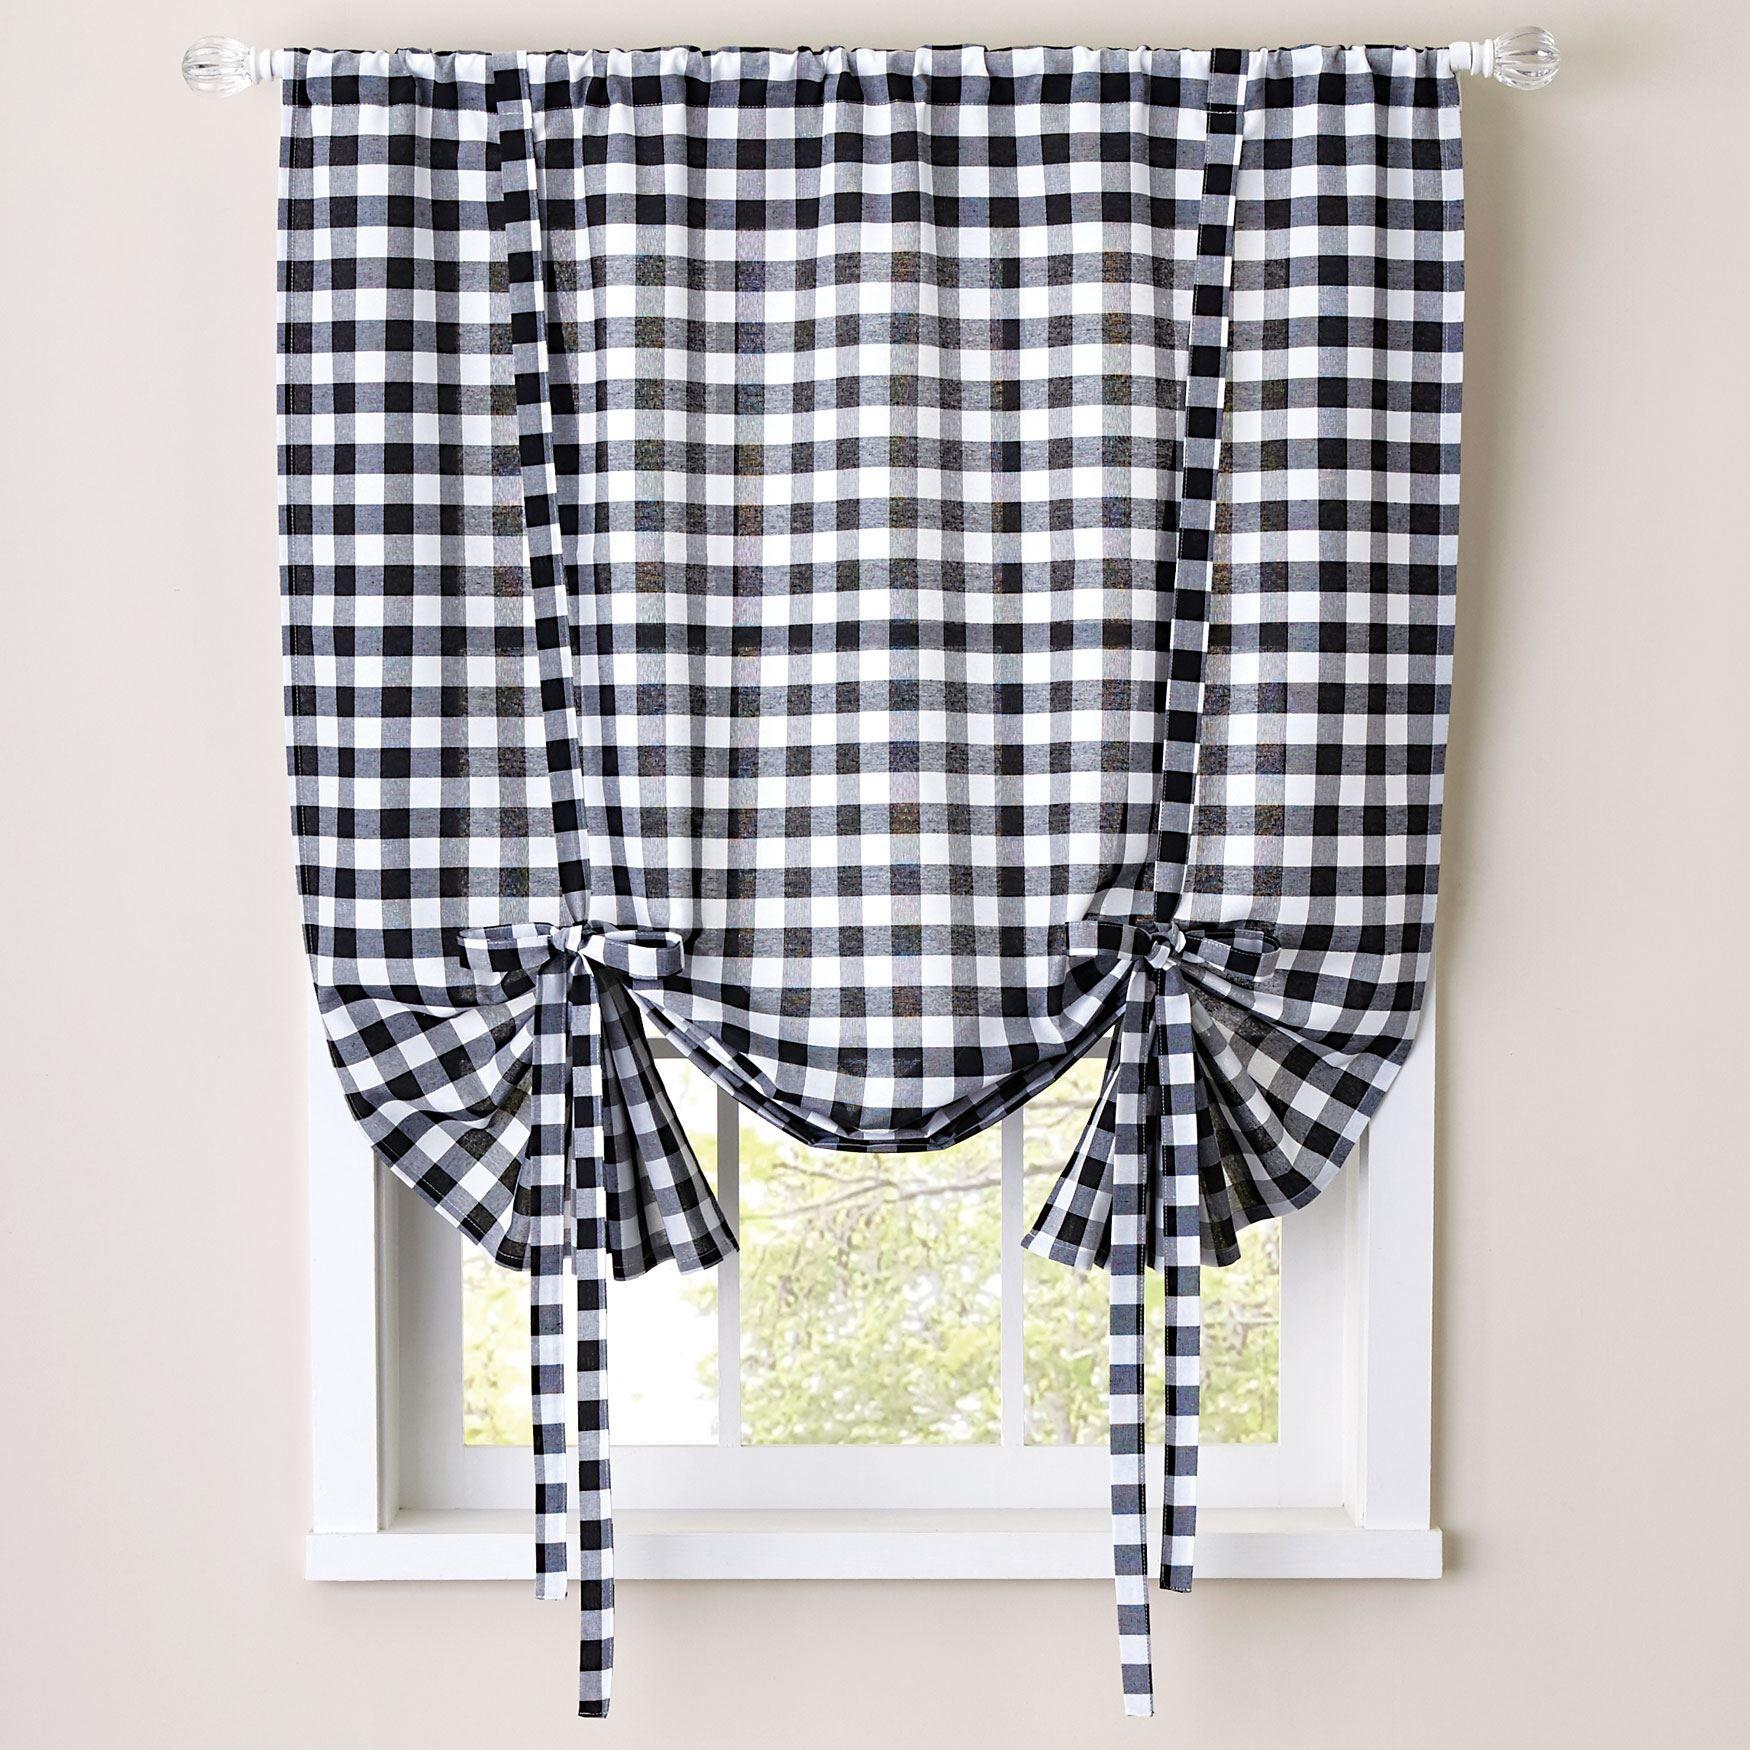 Merveilleux Buffalo Check Tie Up Window Shade